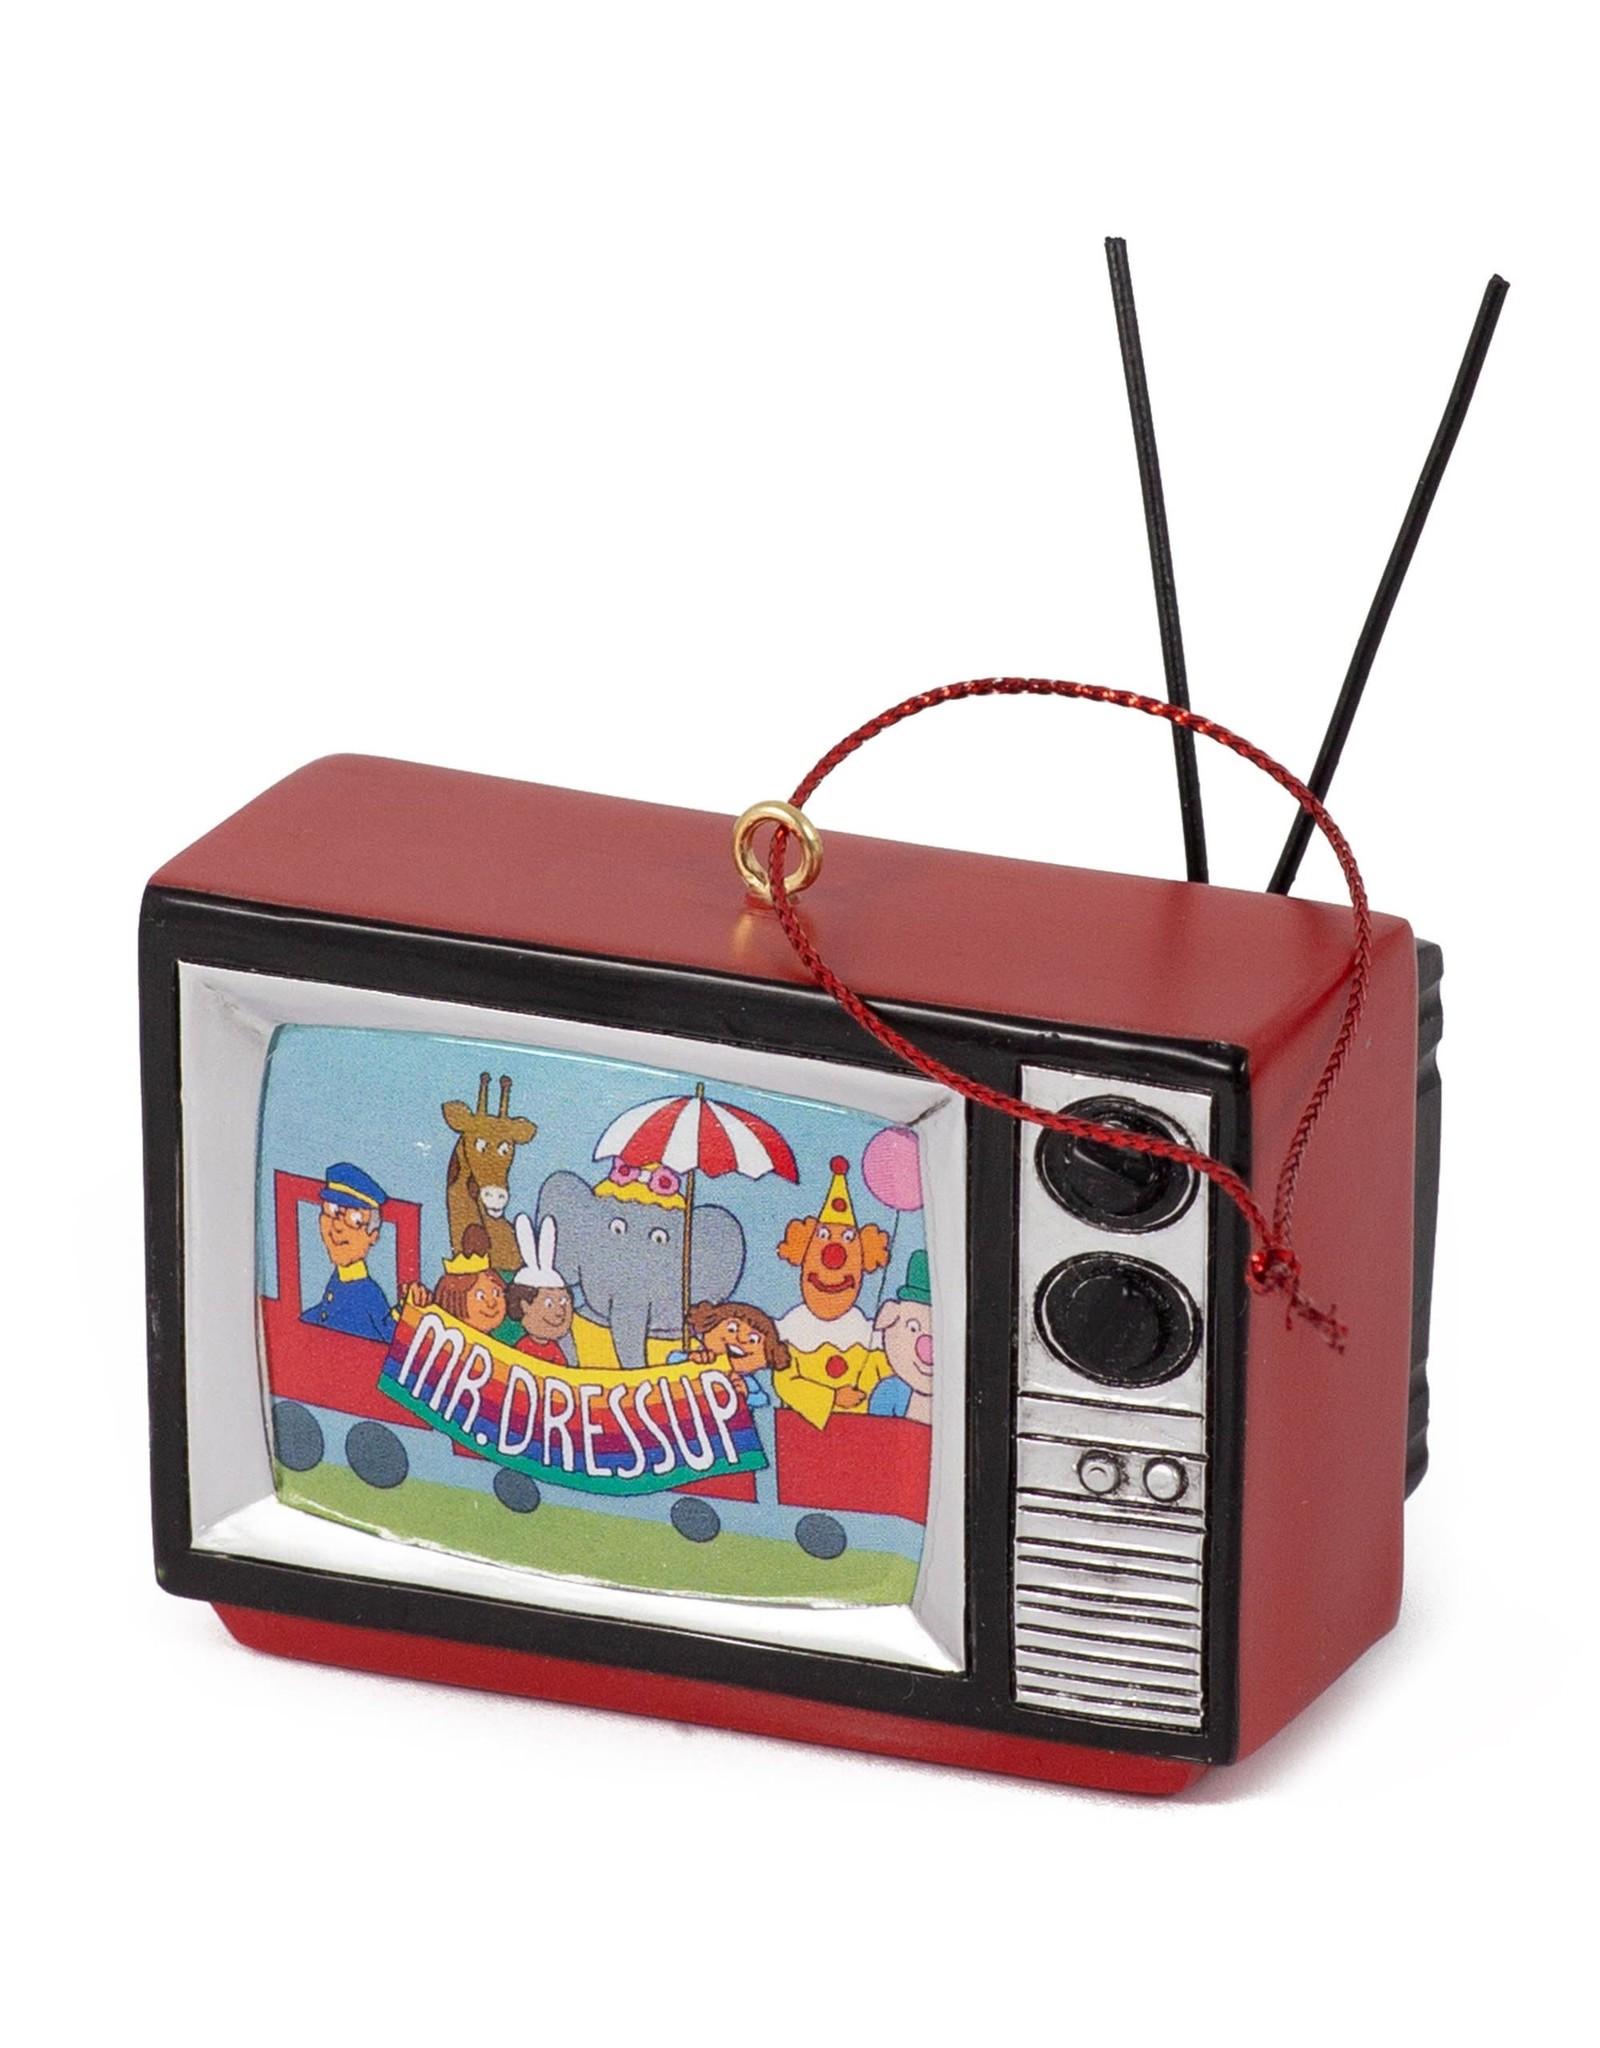 Main & Local TV - Mr. Dressup Ornament